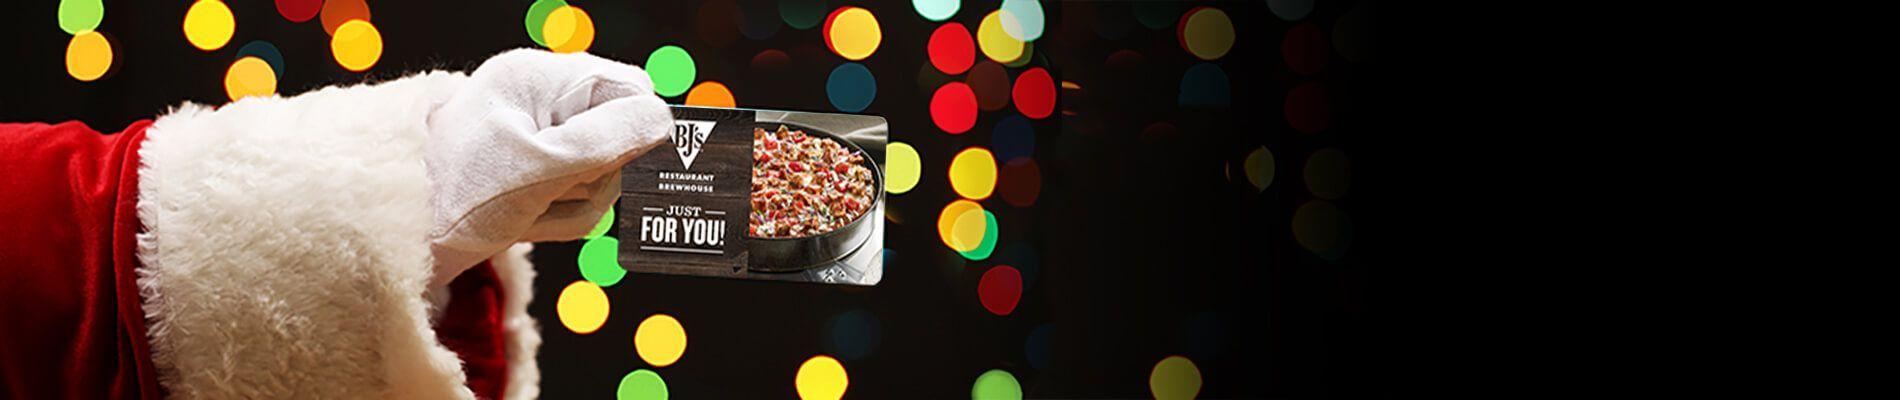 BJs Restaurant Holiday Promotion